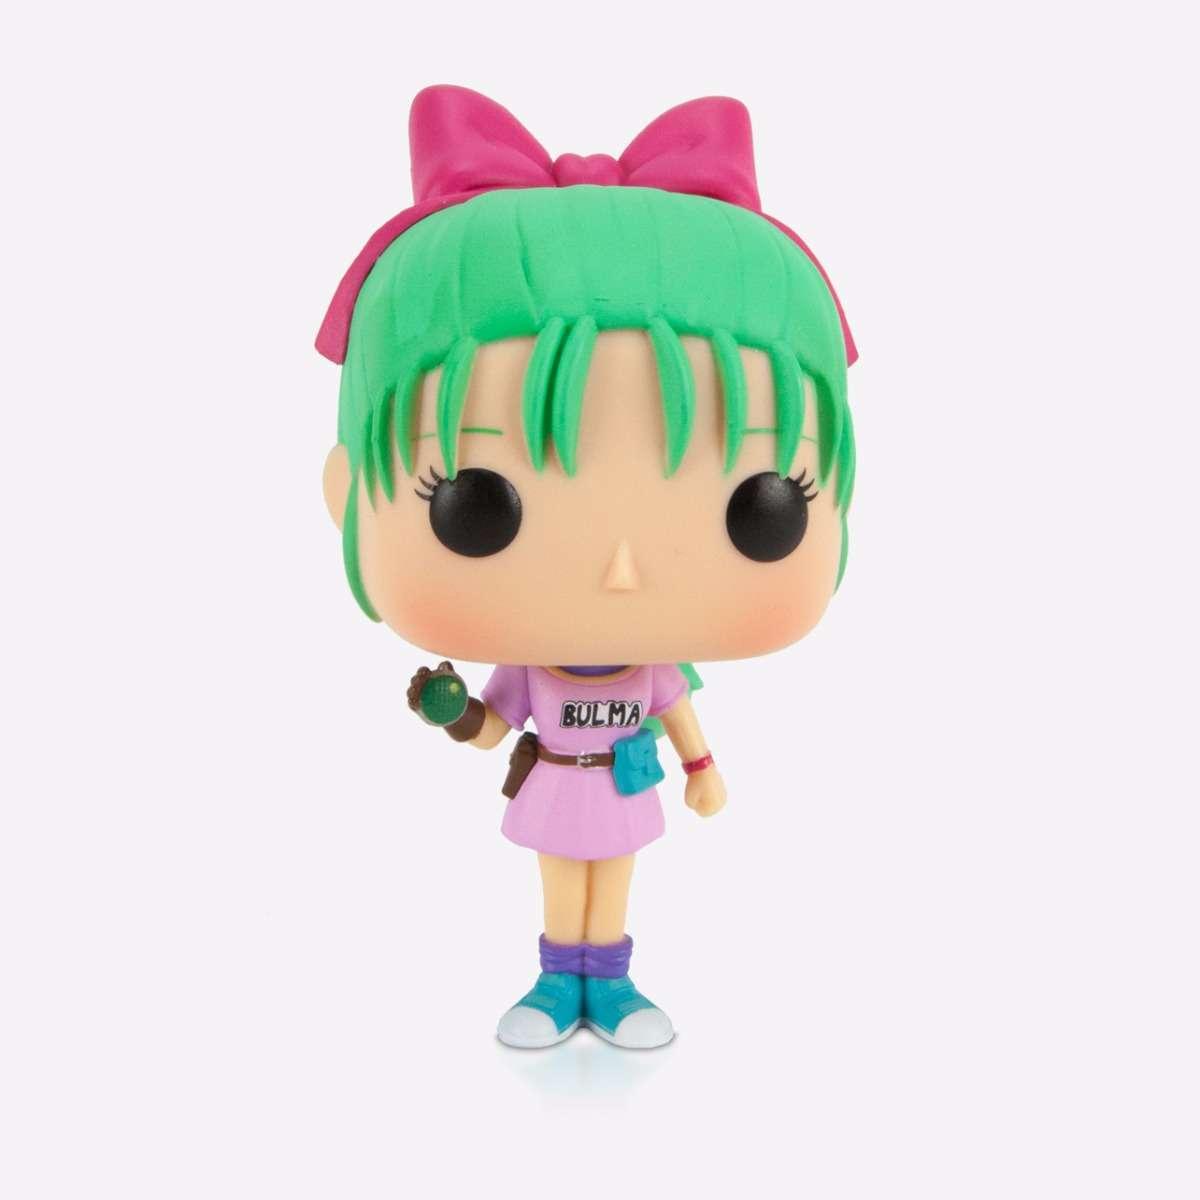 Funko POP - Bulma figures-collectibles